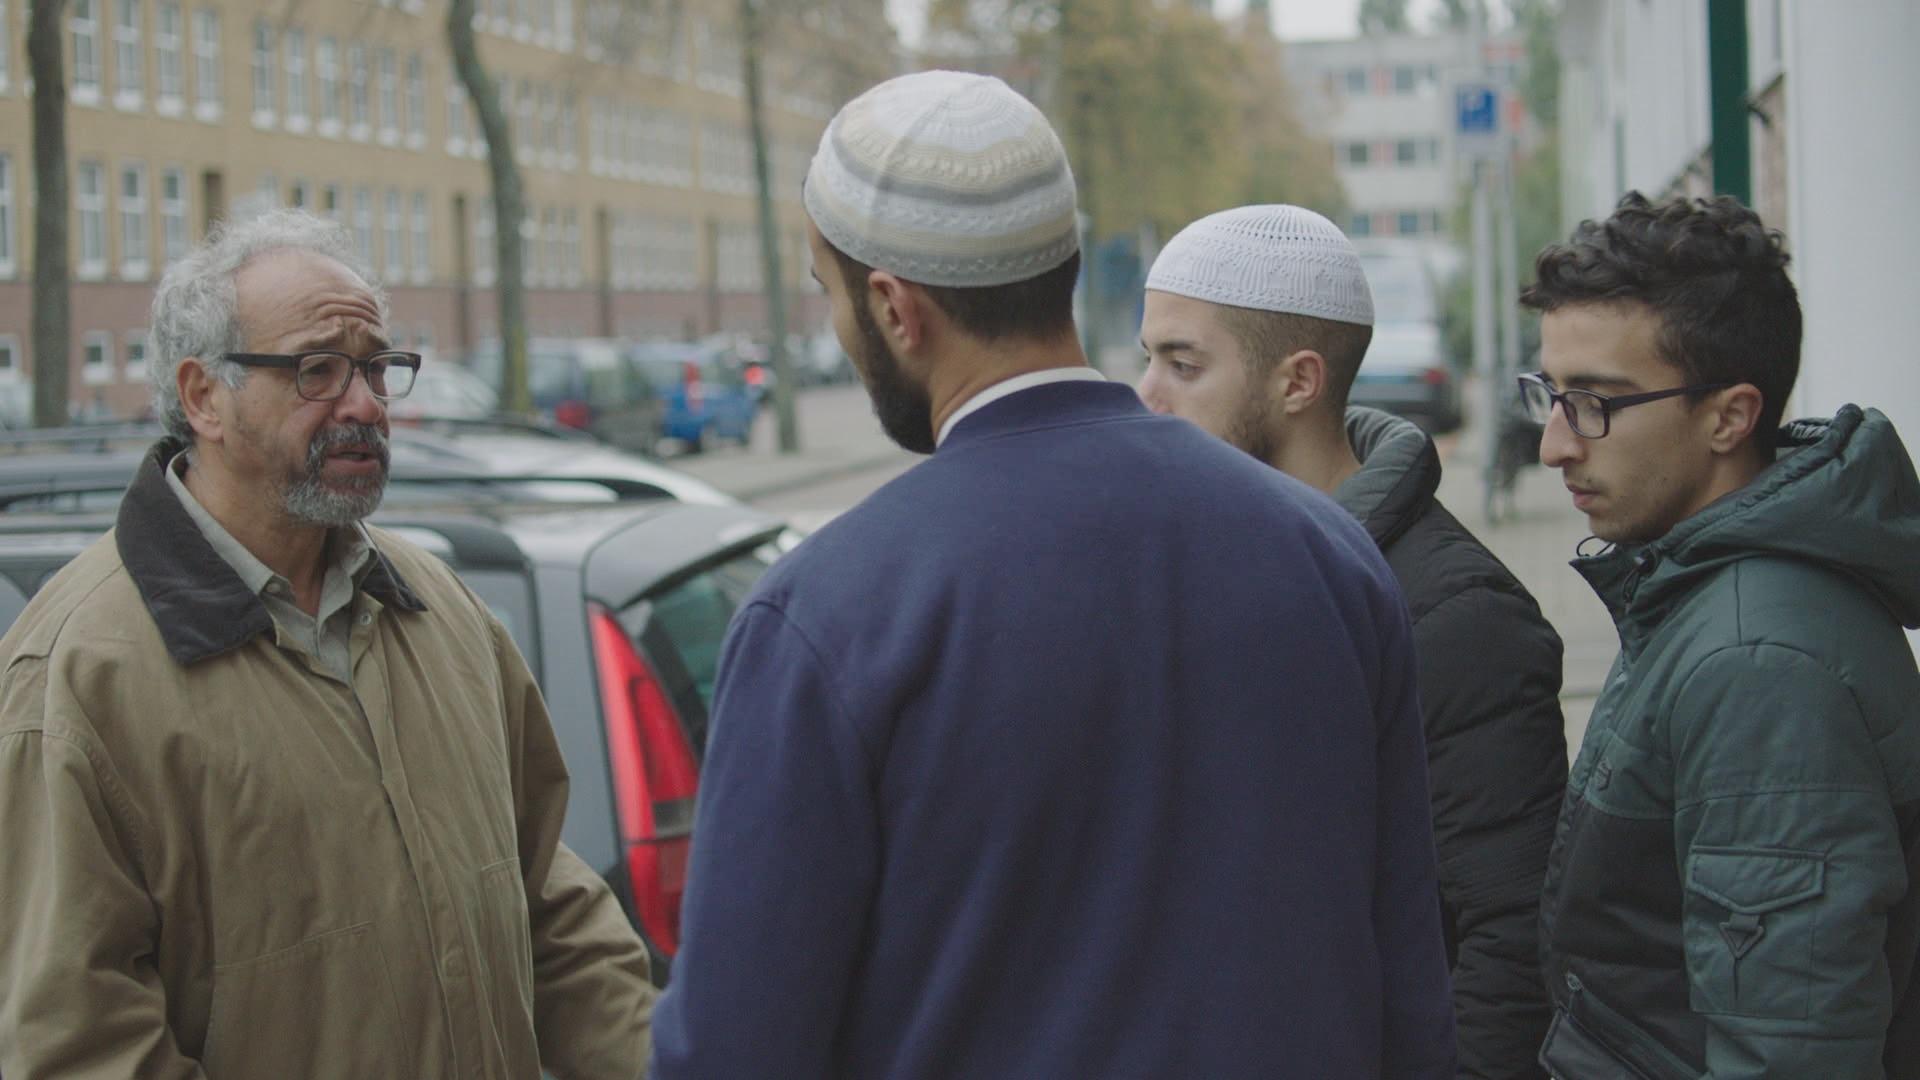 Duivelse dilemma's: Mijn zoon is jihadist